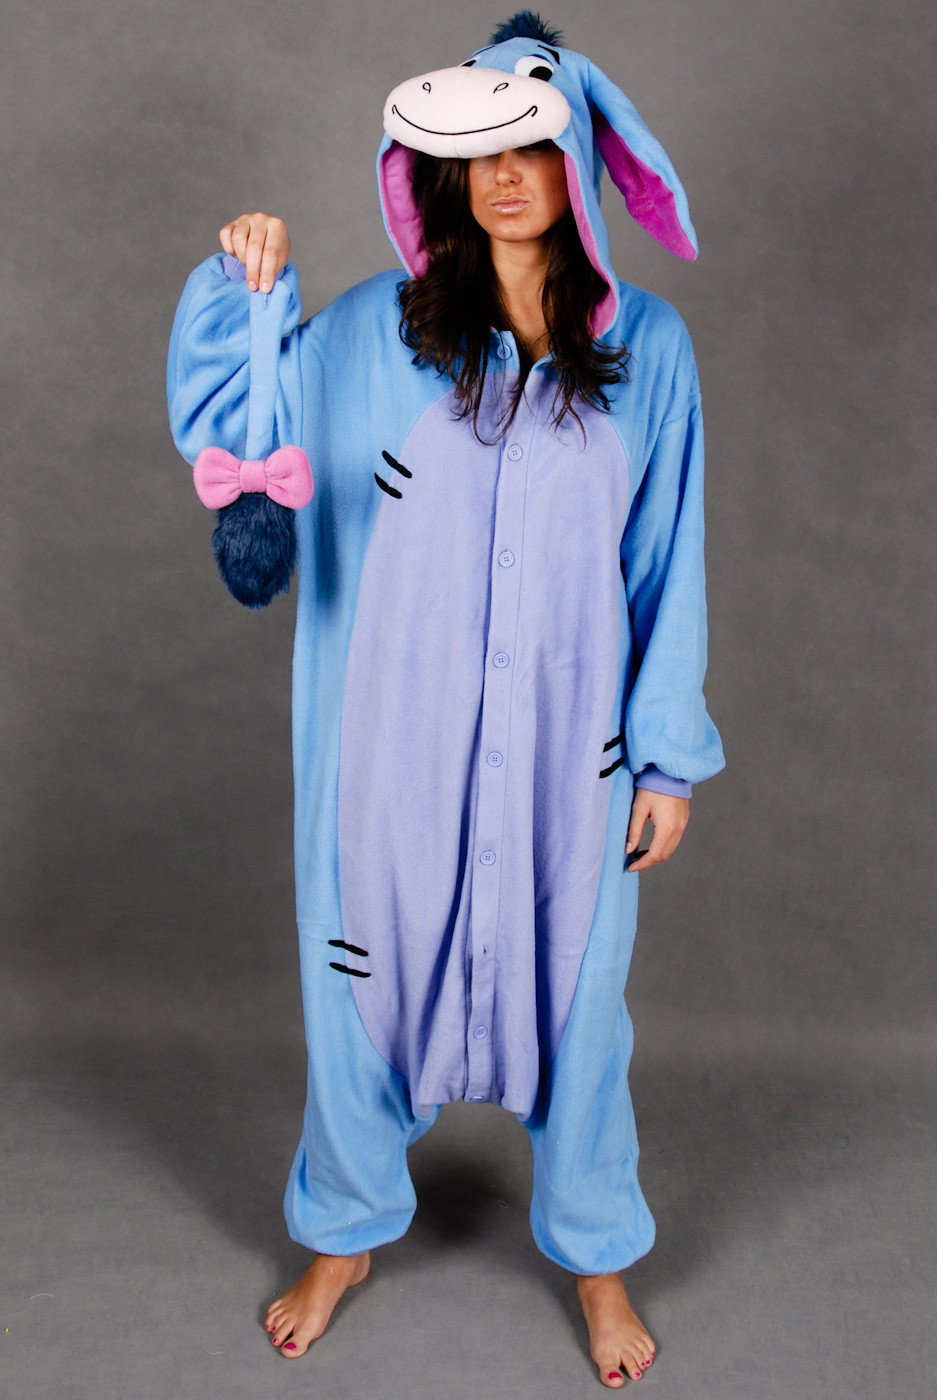 Best ideas about Eeyore Costume DIY . Save or Pin Eeyore Costumes Now.